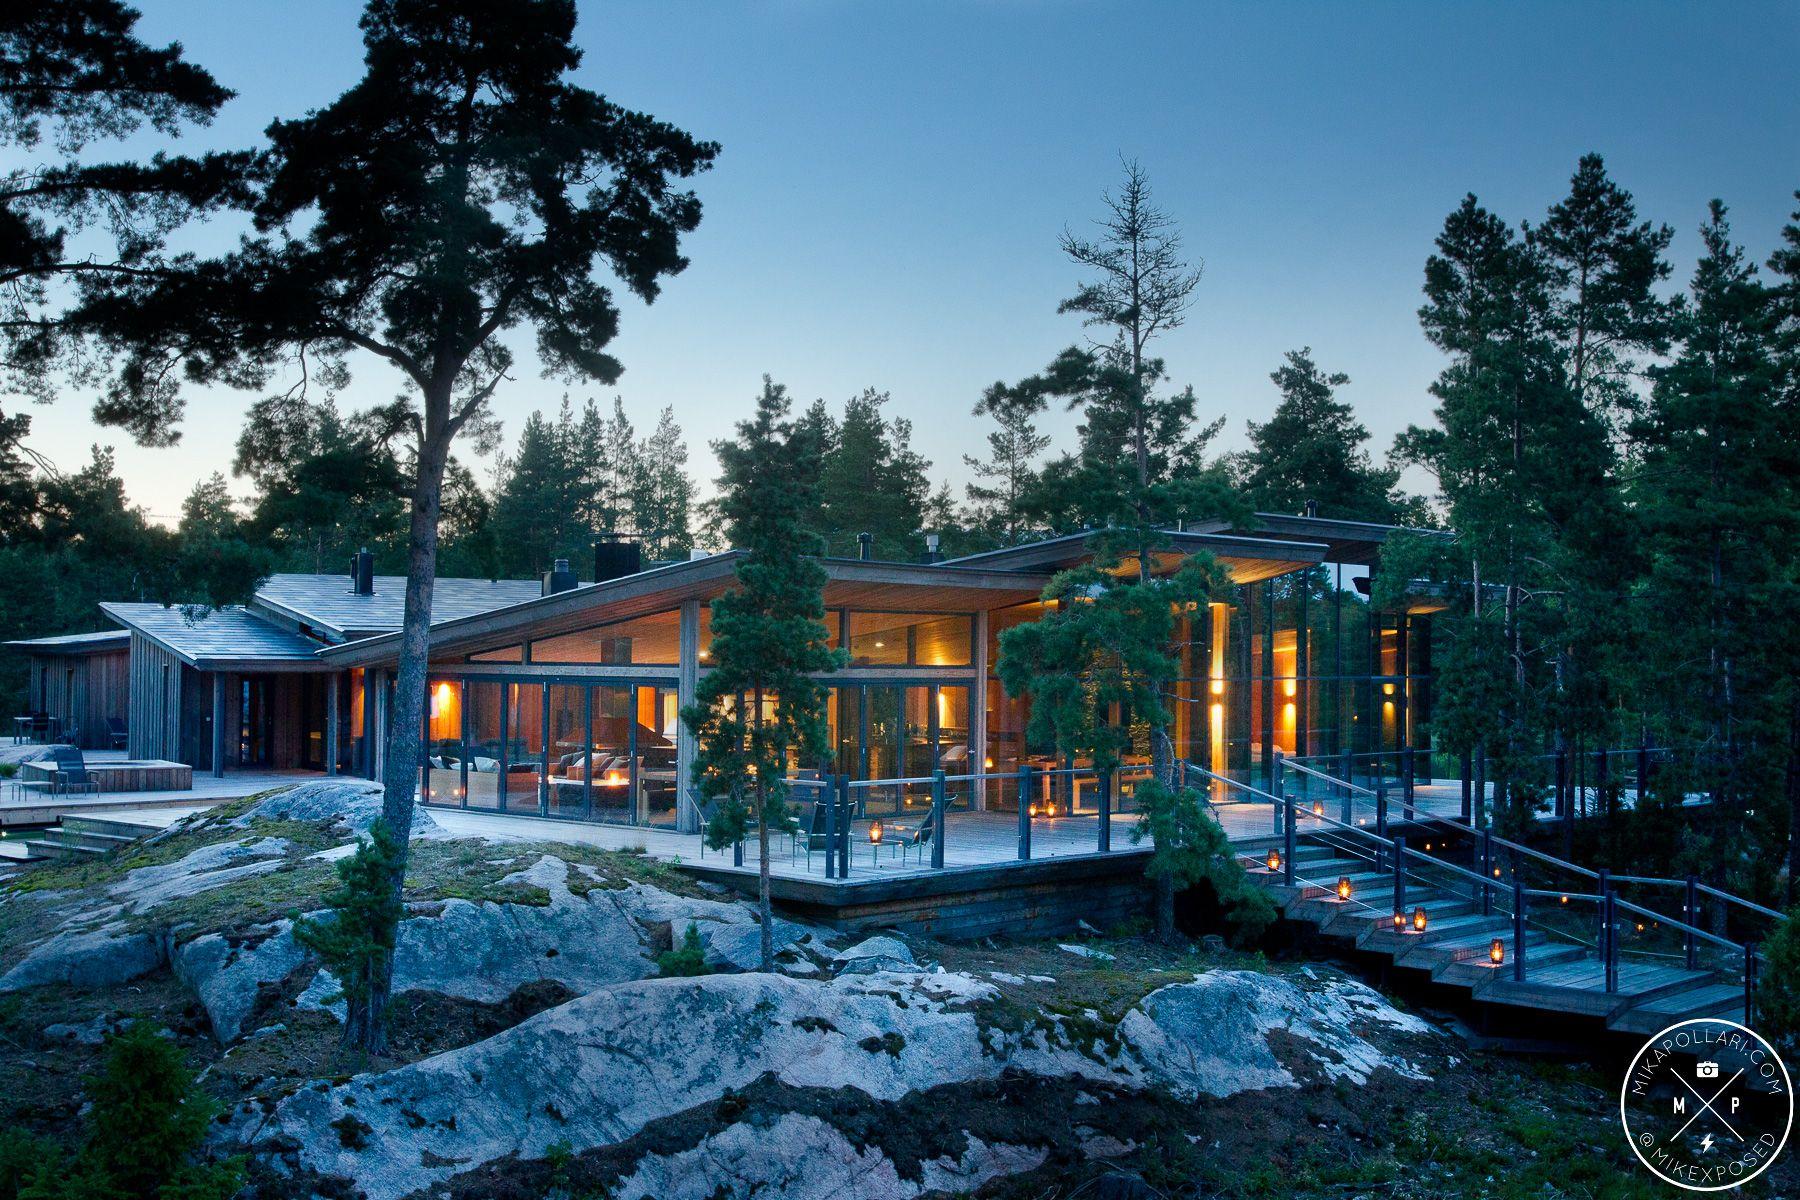 Villa Korsholmen - Mika Pollari Photography